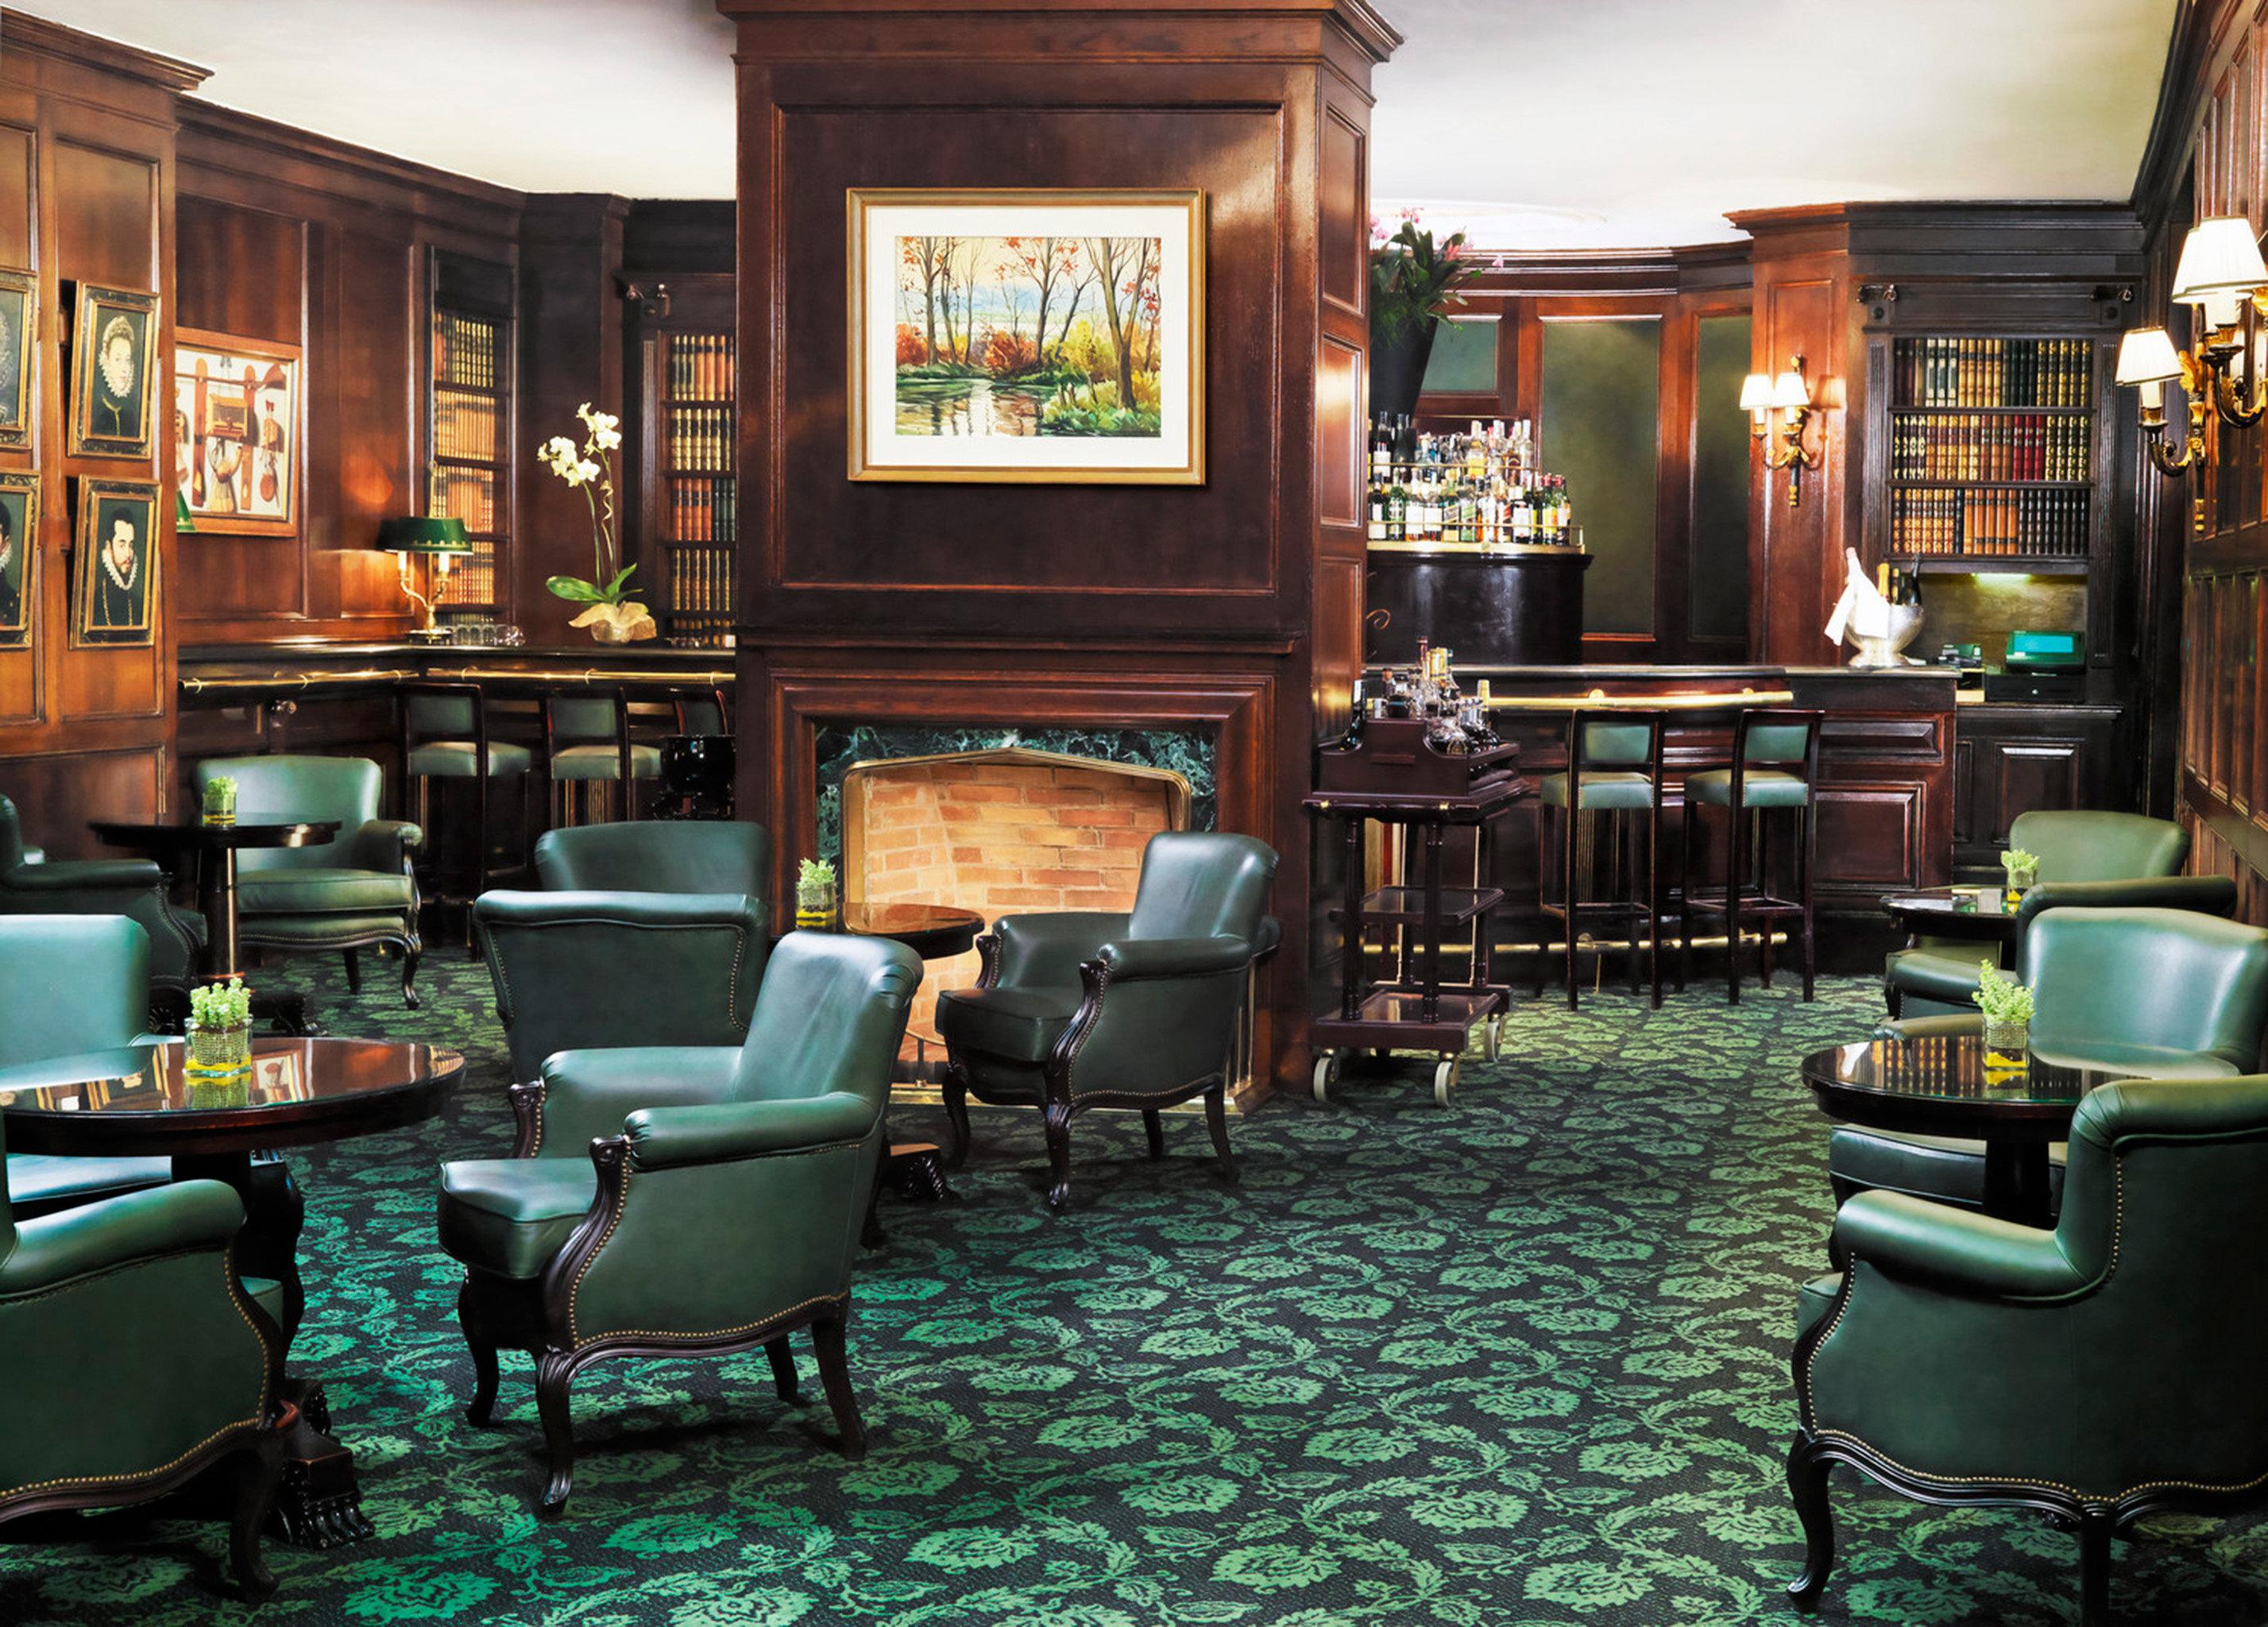 Elegant Historic Lounge Luxury chair green Bar restaurant café coffeehouse